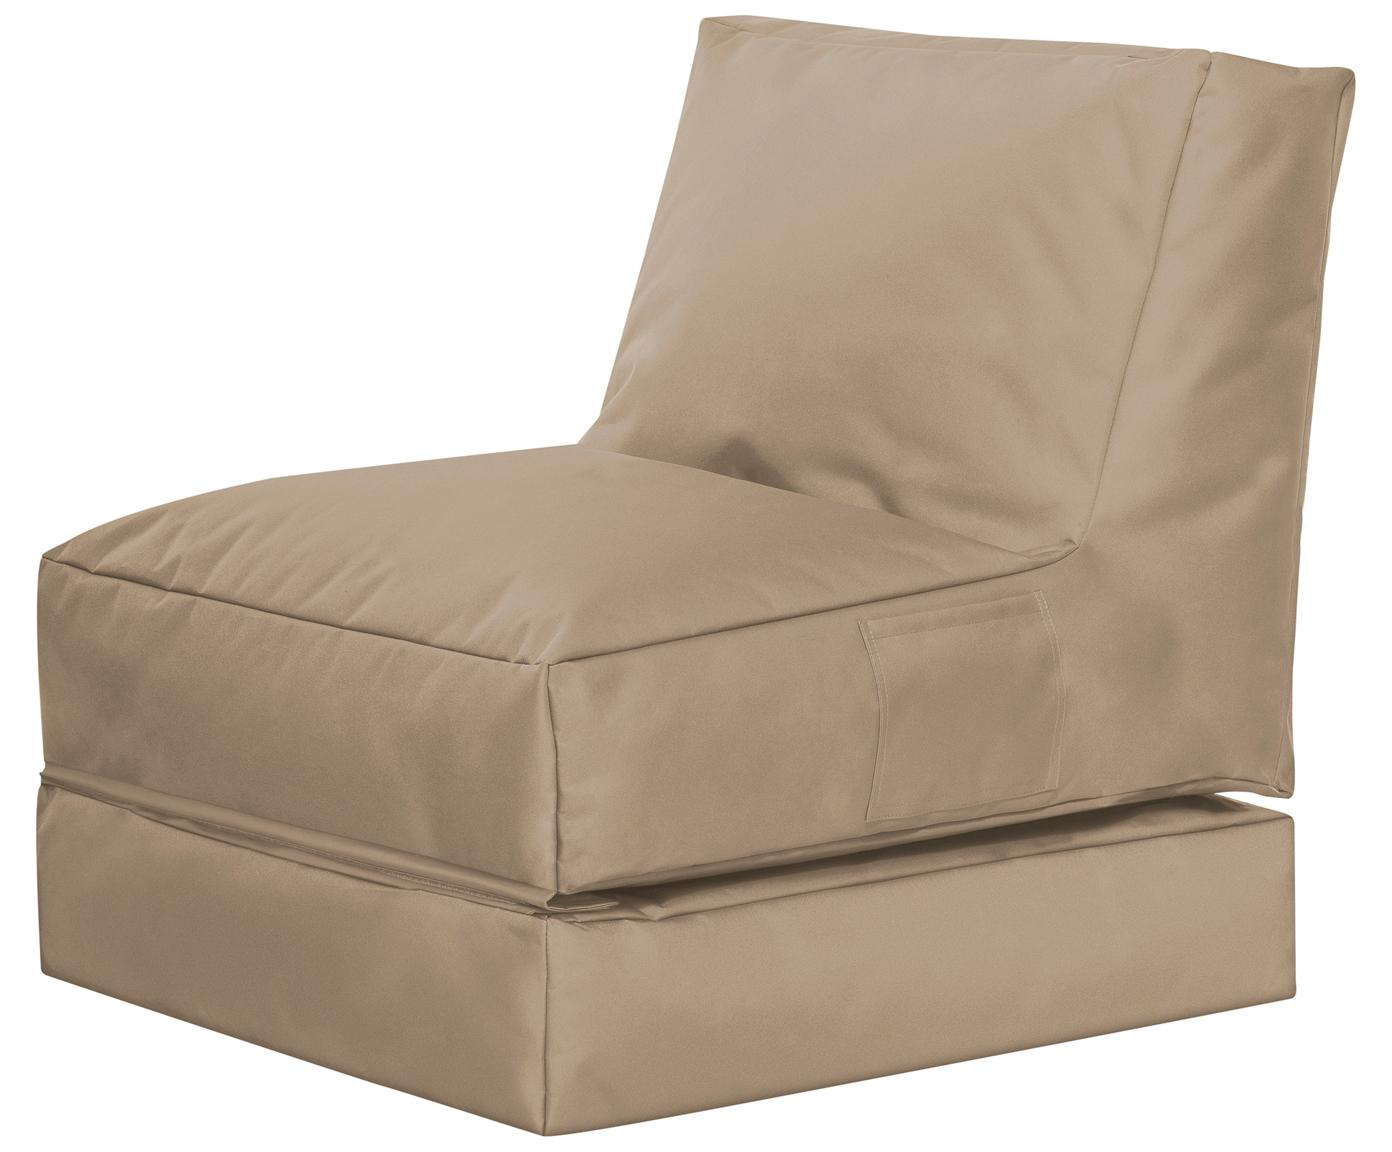 Sillón de jardín Pop Up, reclinable, Tapizado: 100%poliéster Interior c, Caqui, An 70 x Al 80 cm